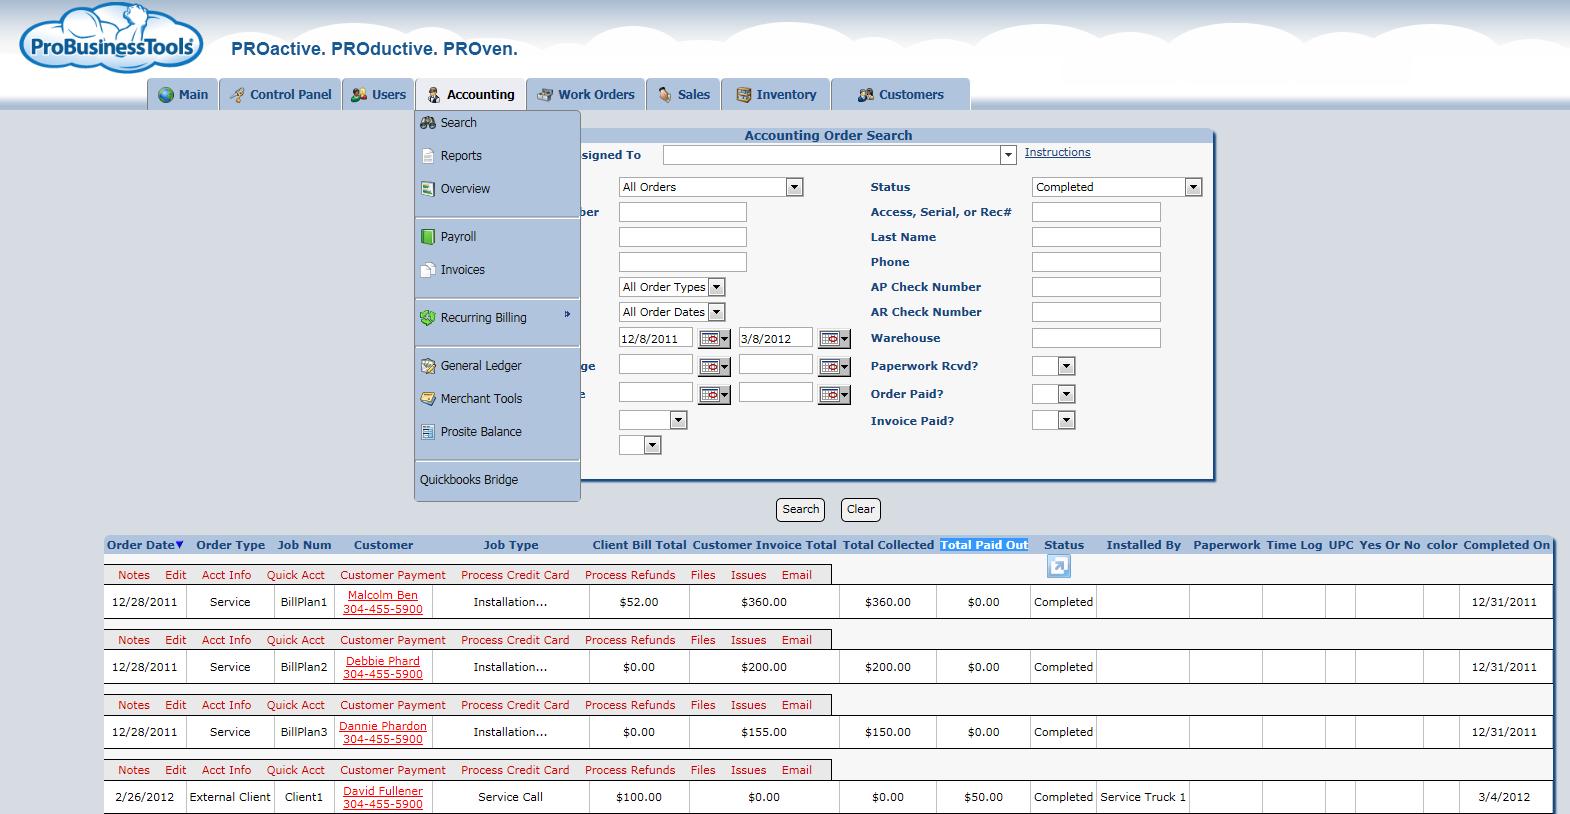 ProBusinessTools - Accounting Options